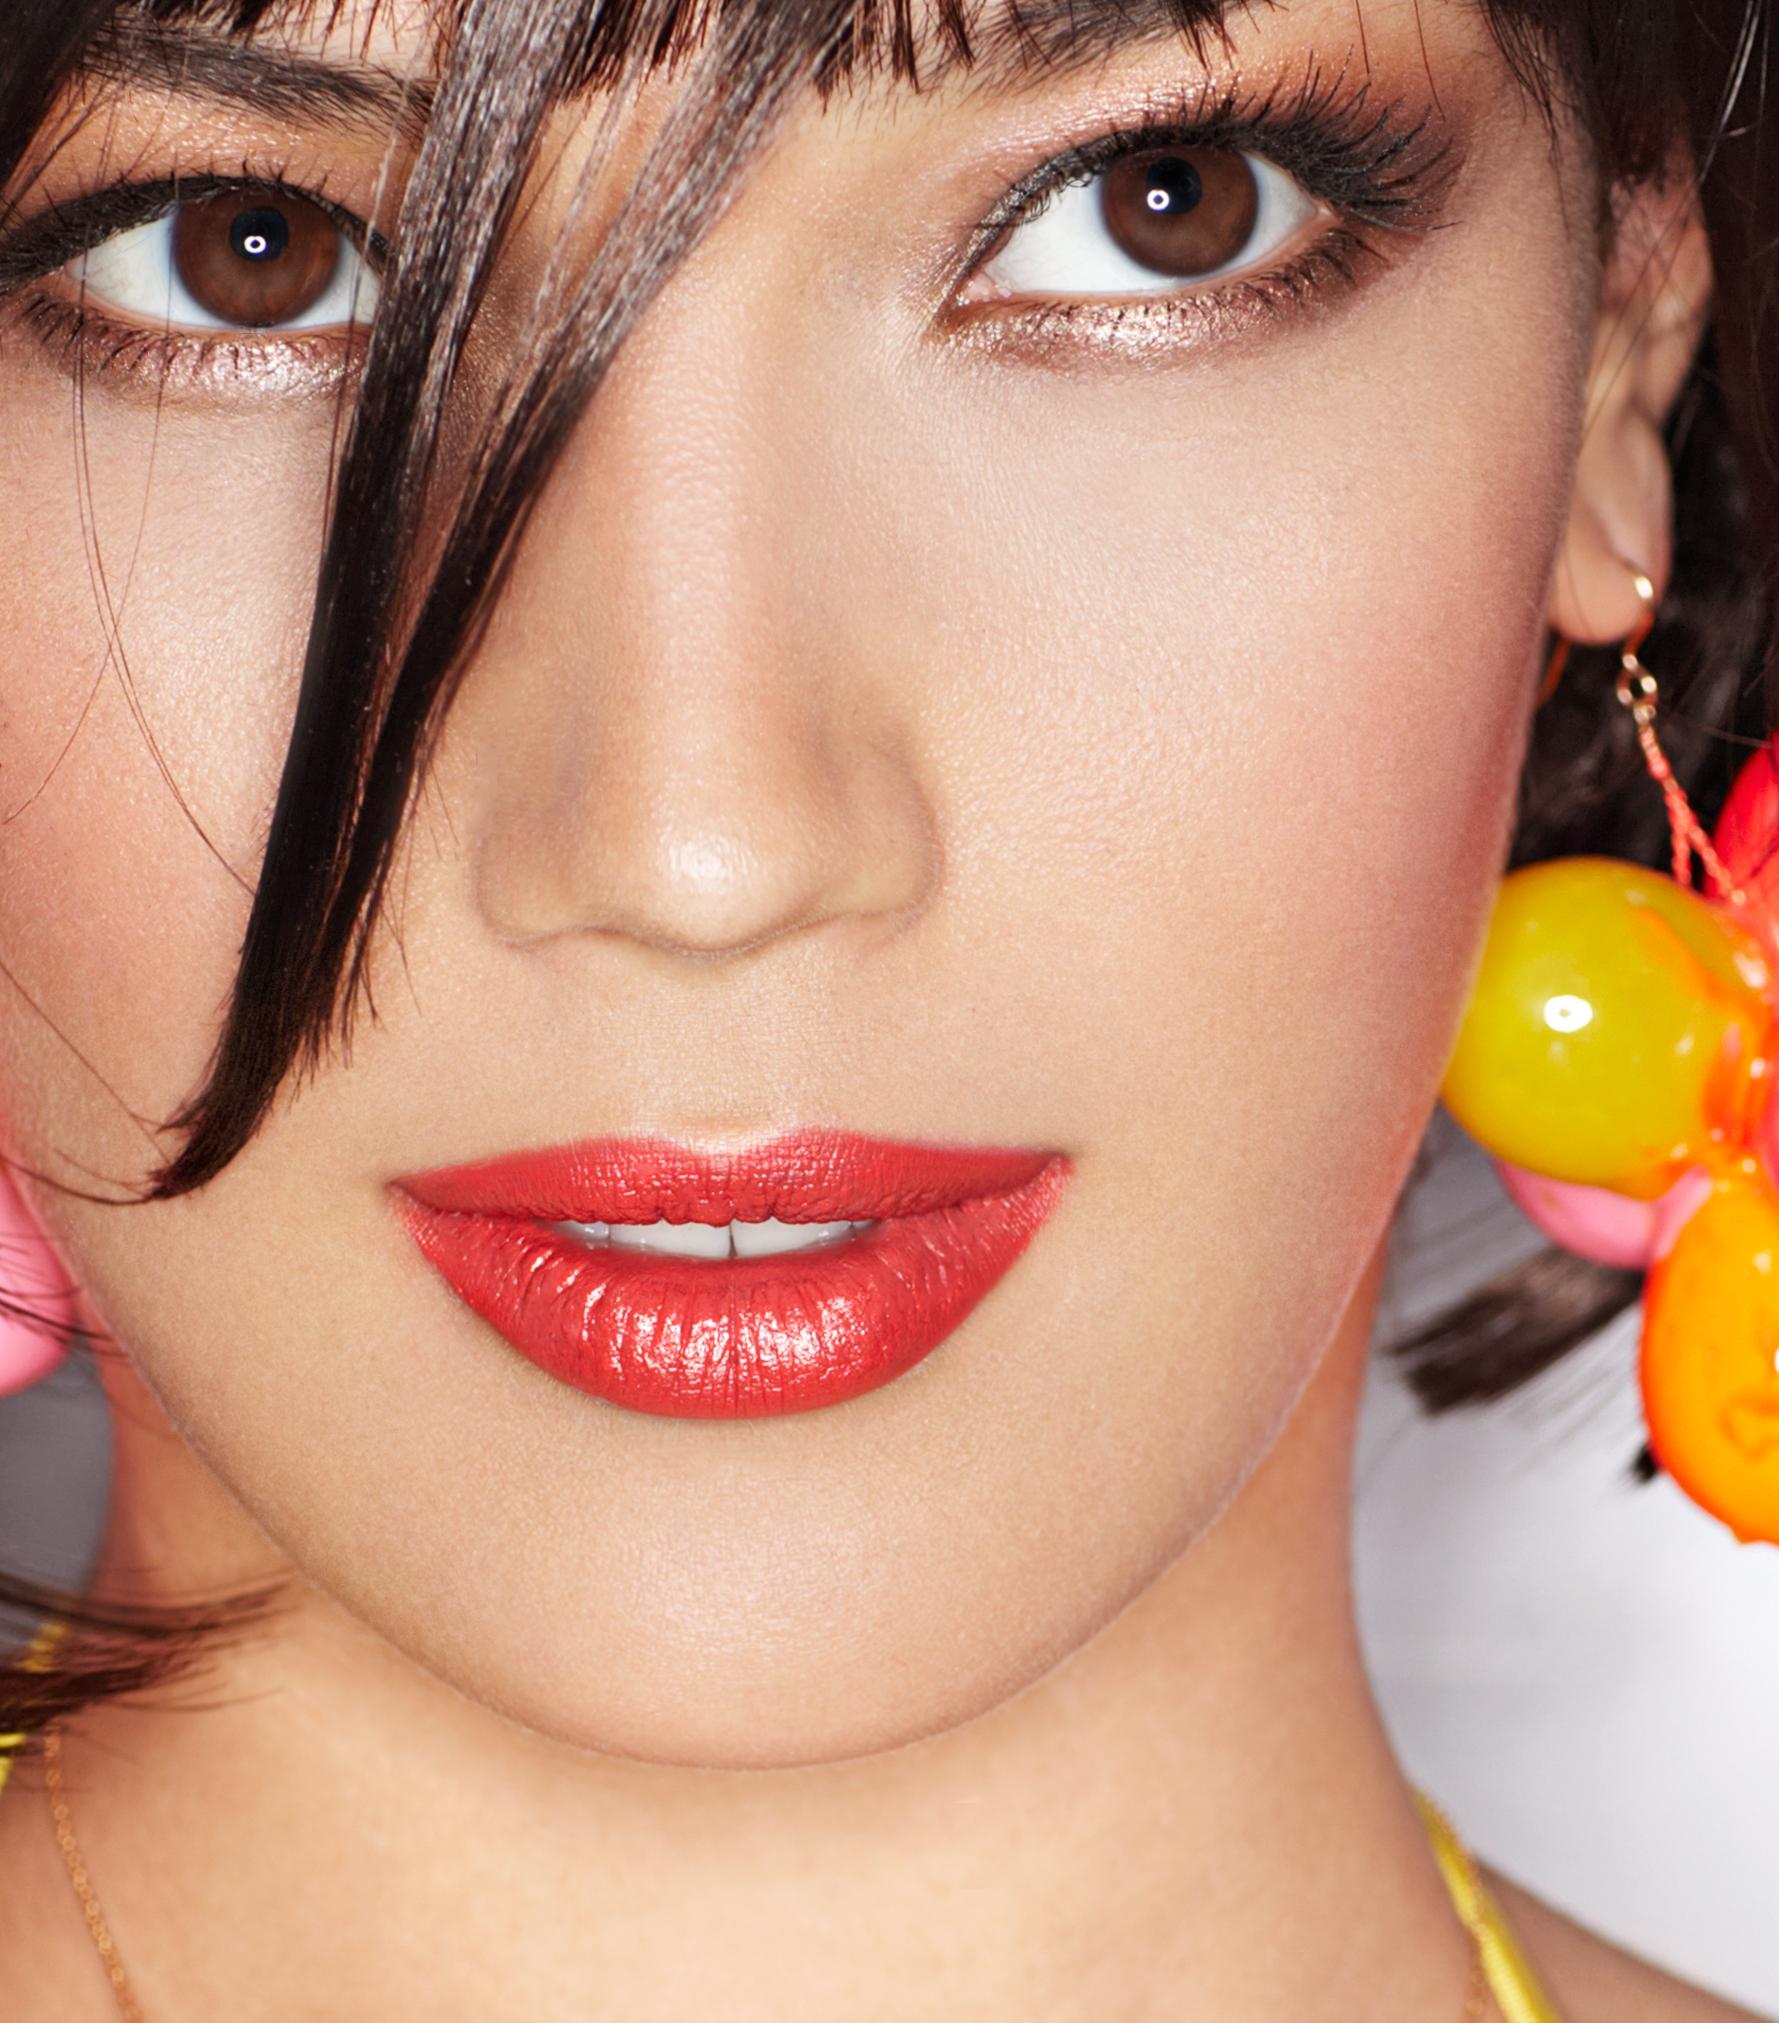 c_Cosmo_Beauty_Make up_Beauty _Eyes,retouching thomas canny studio.jpg